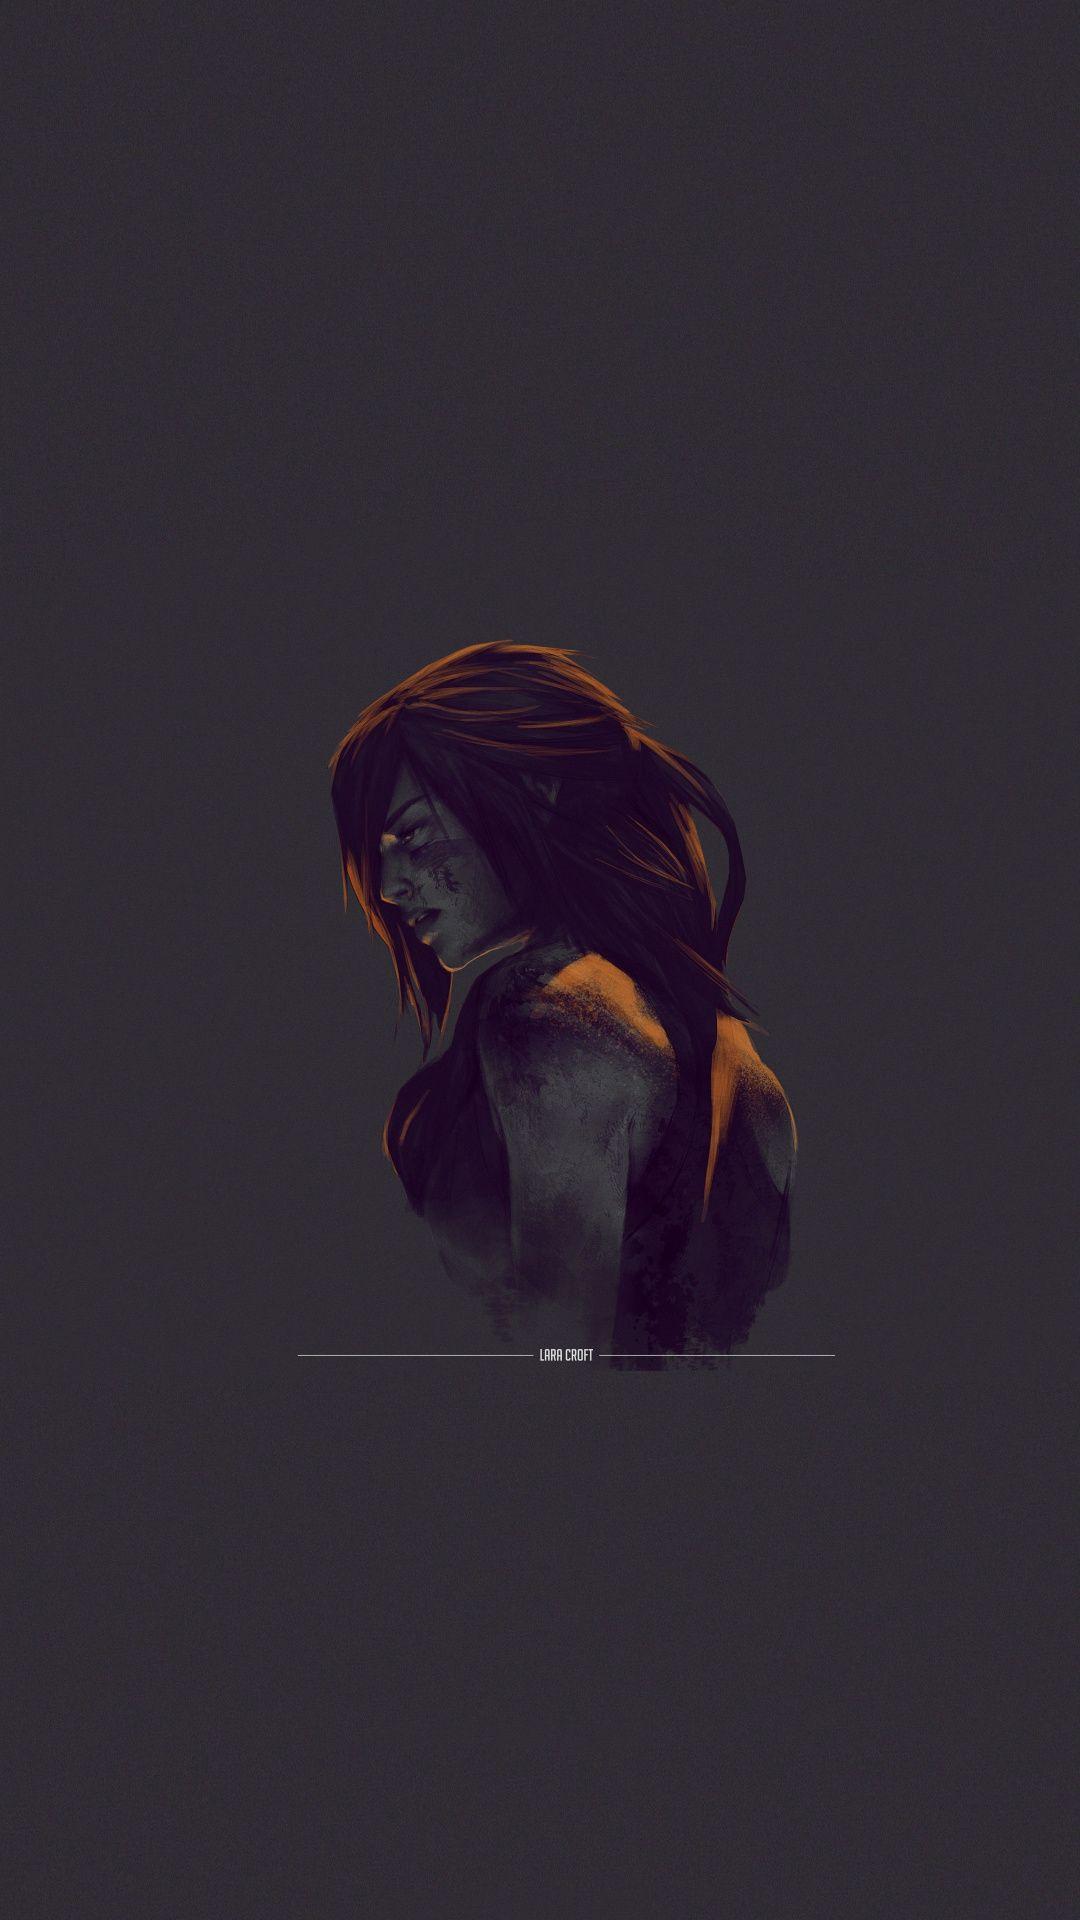 Artwork Shadow Of The Tomb Raider Video Game Lara Croft